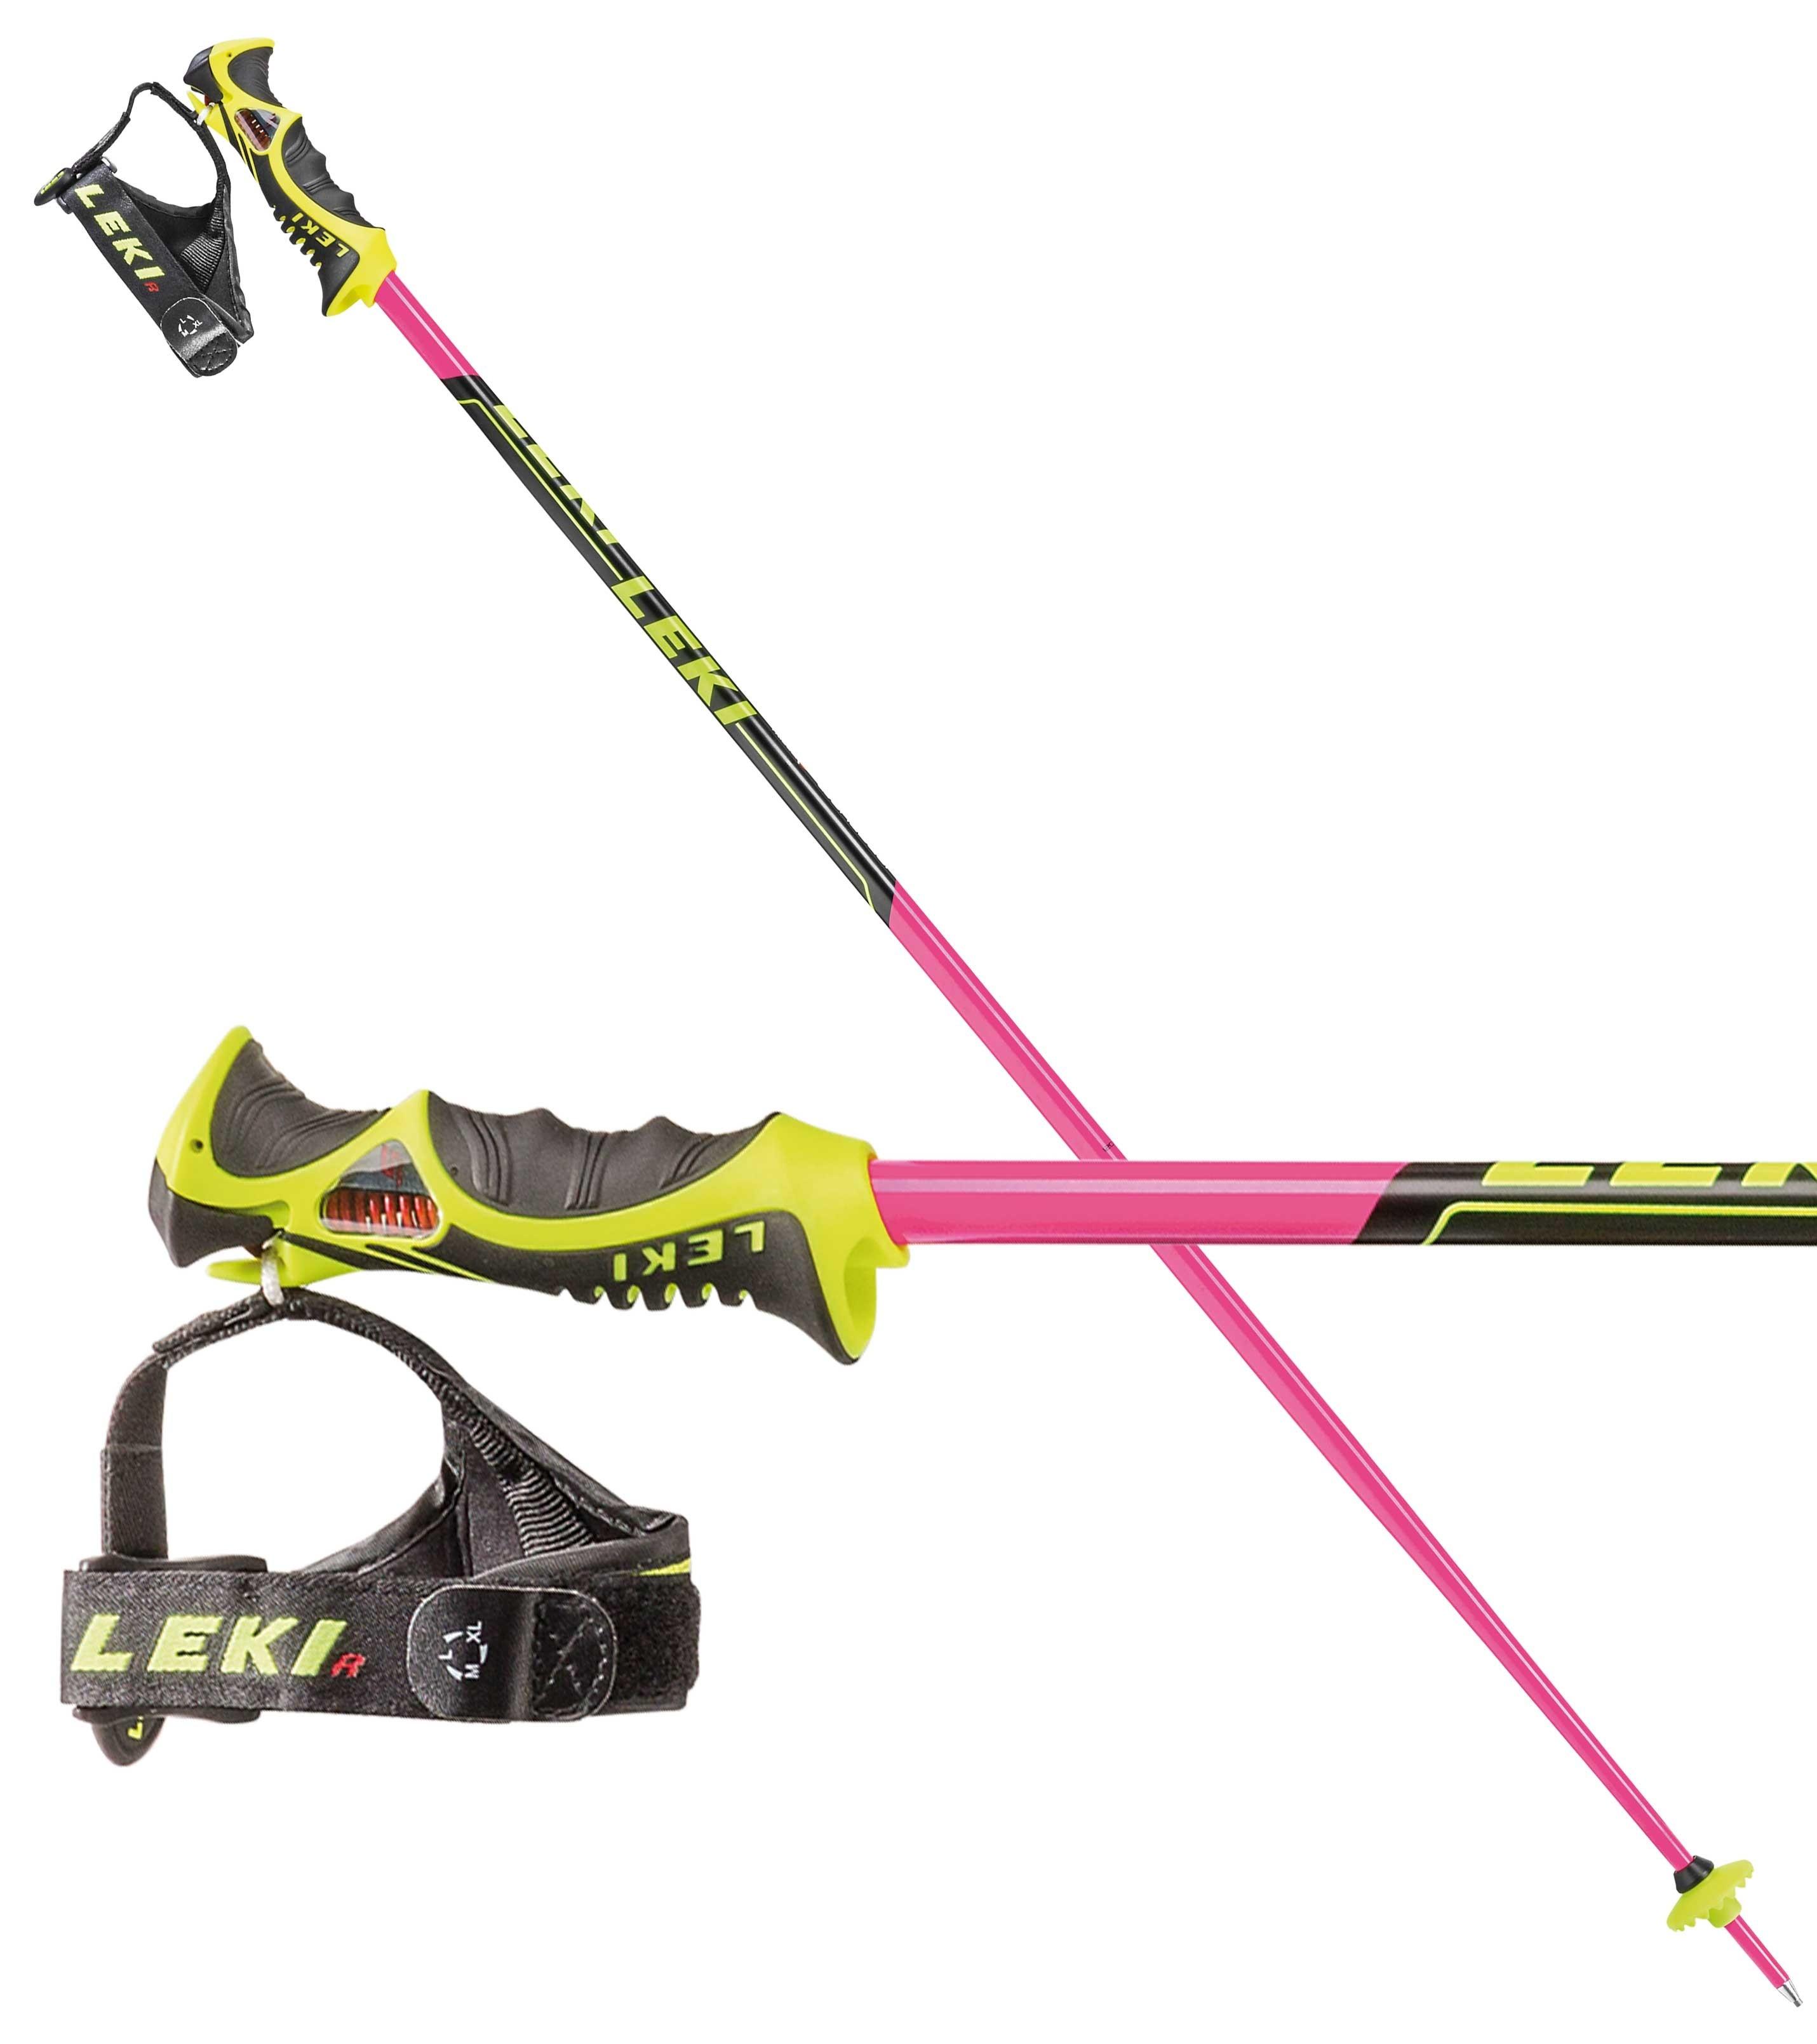 Leki WorldCup Racing SL TR-S TBS ski poles - pink, 2018